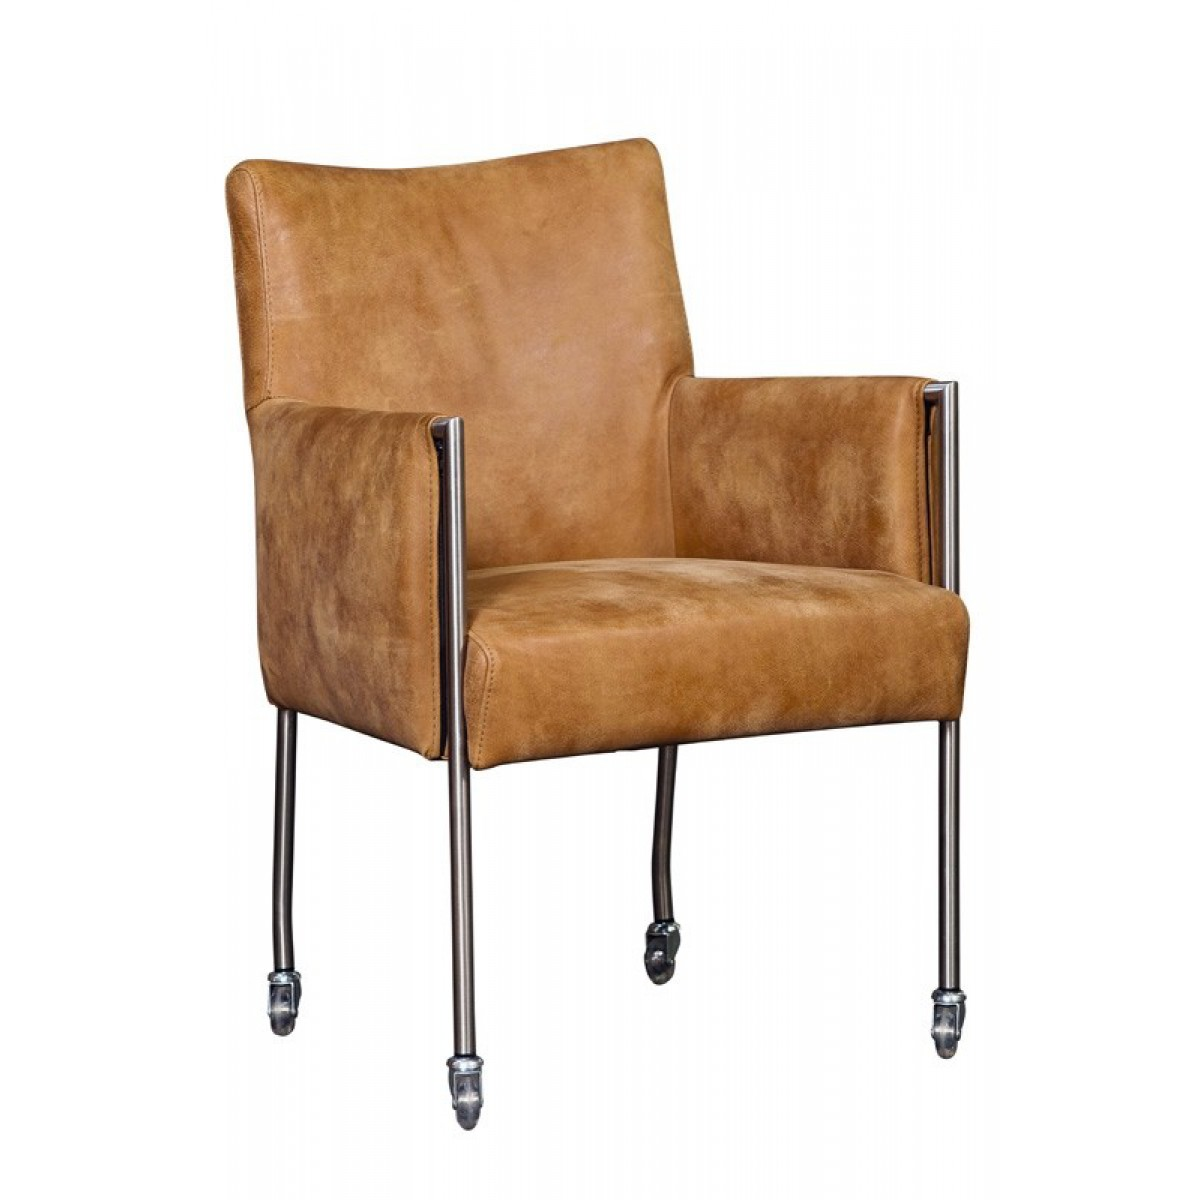 laura-armstoel-stoel-eetkamerstoel-op-wielen-africa-leer-het-anker